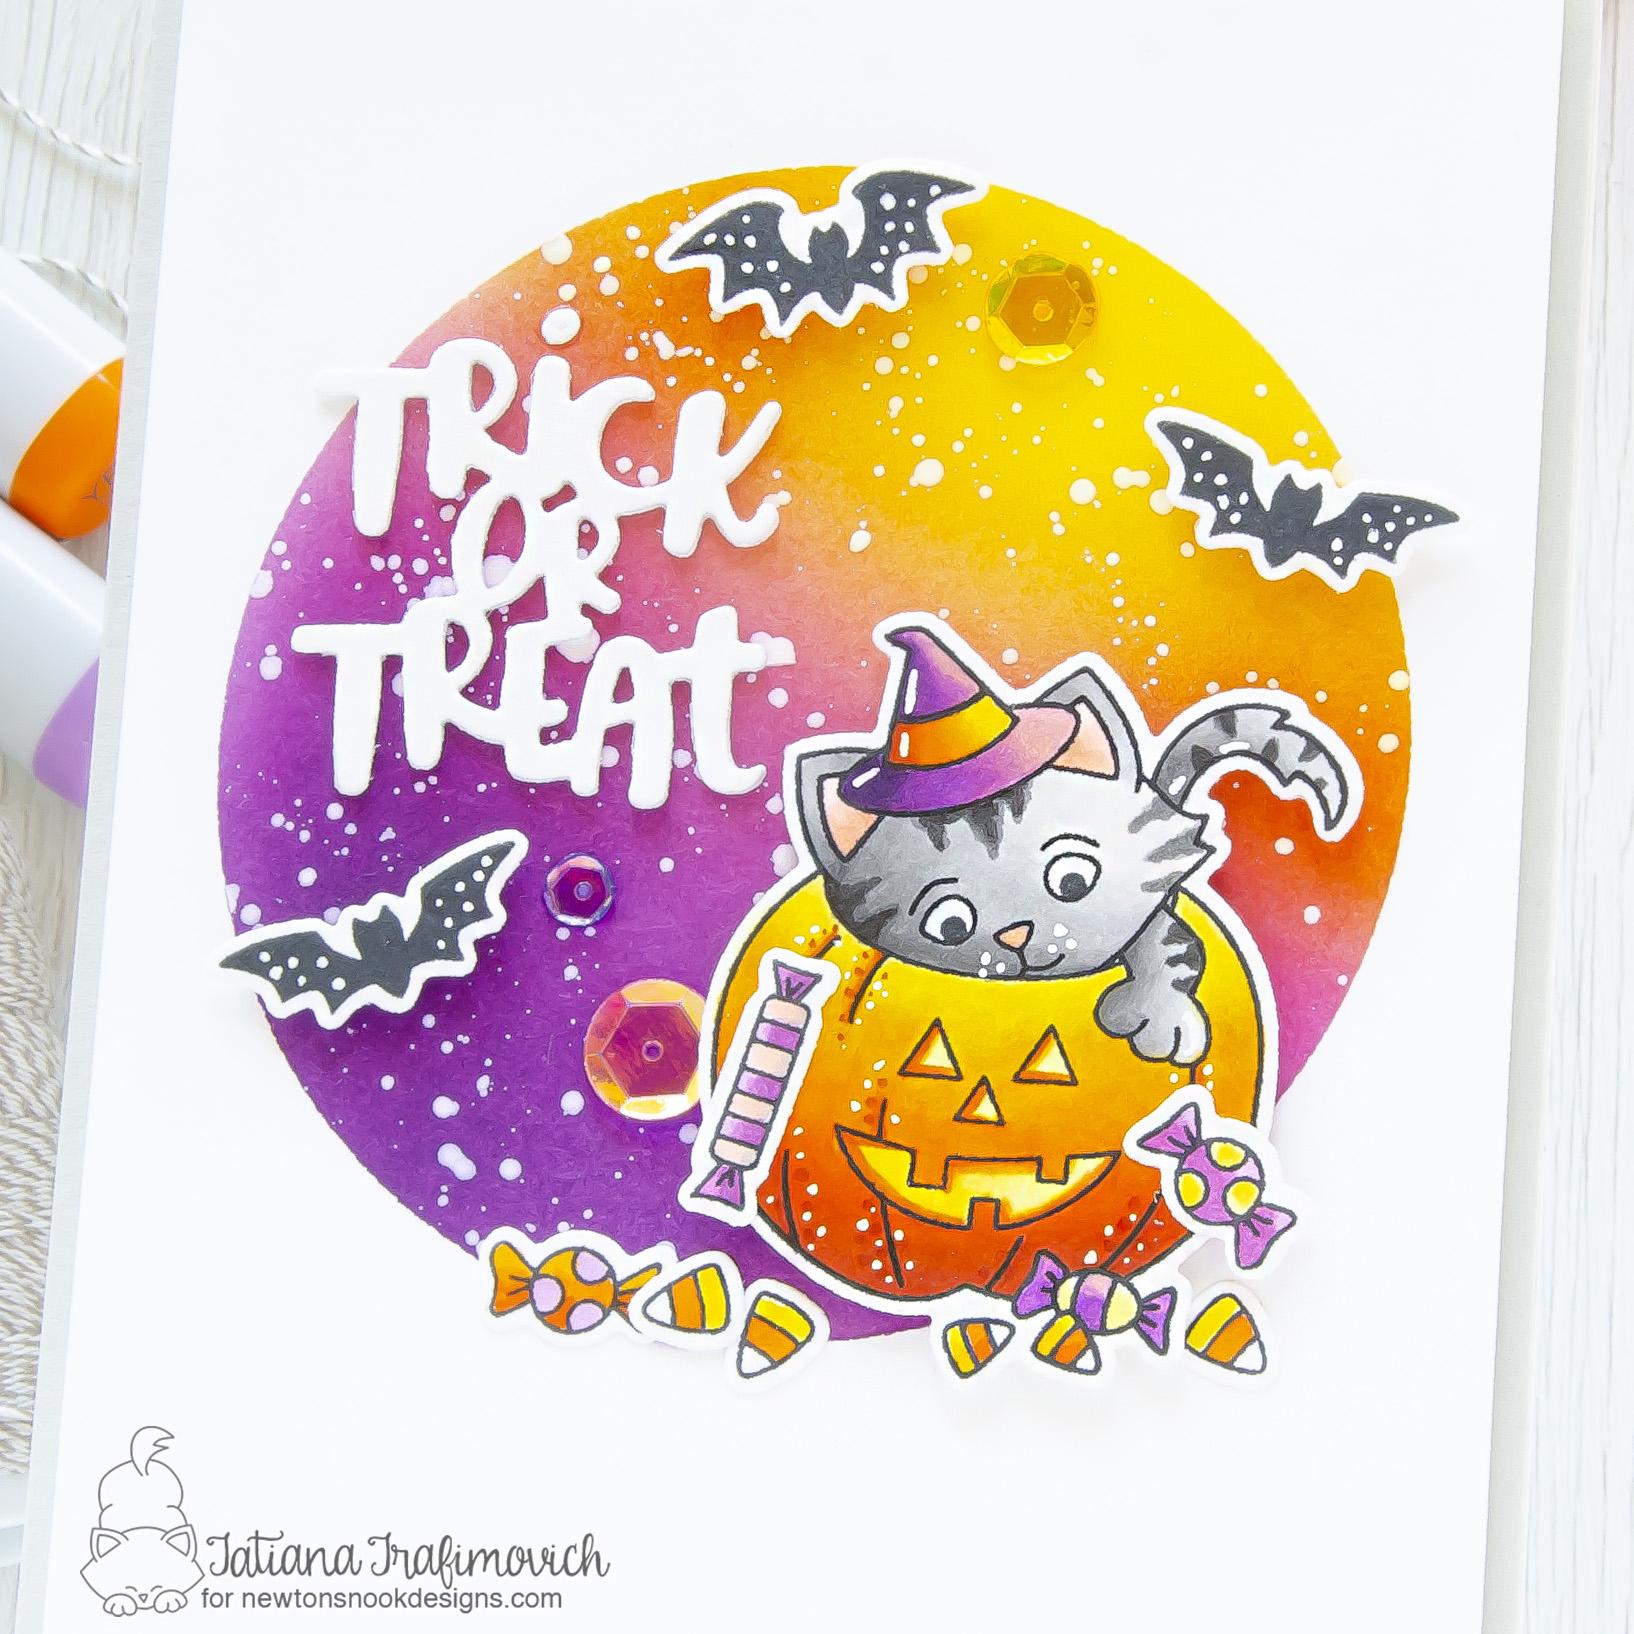 Trick or Treat #handmade card by Tatiana Trafimovich #tatianacraftandart - Trick or Treat Kittens stamp set by Newton's Nook Designs #newtonsnook